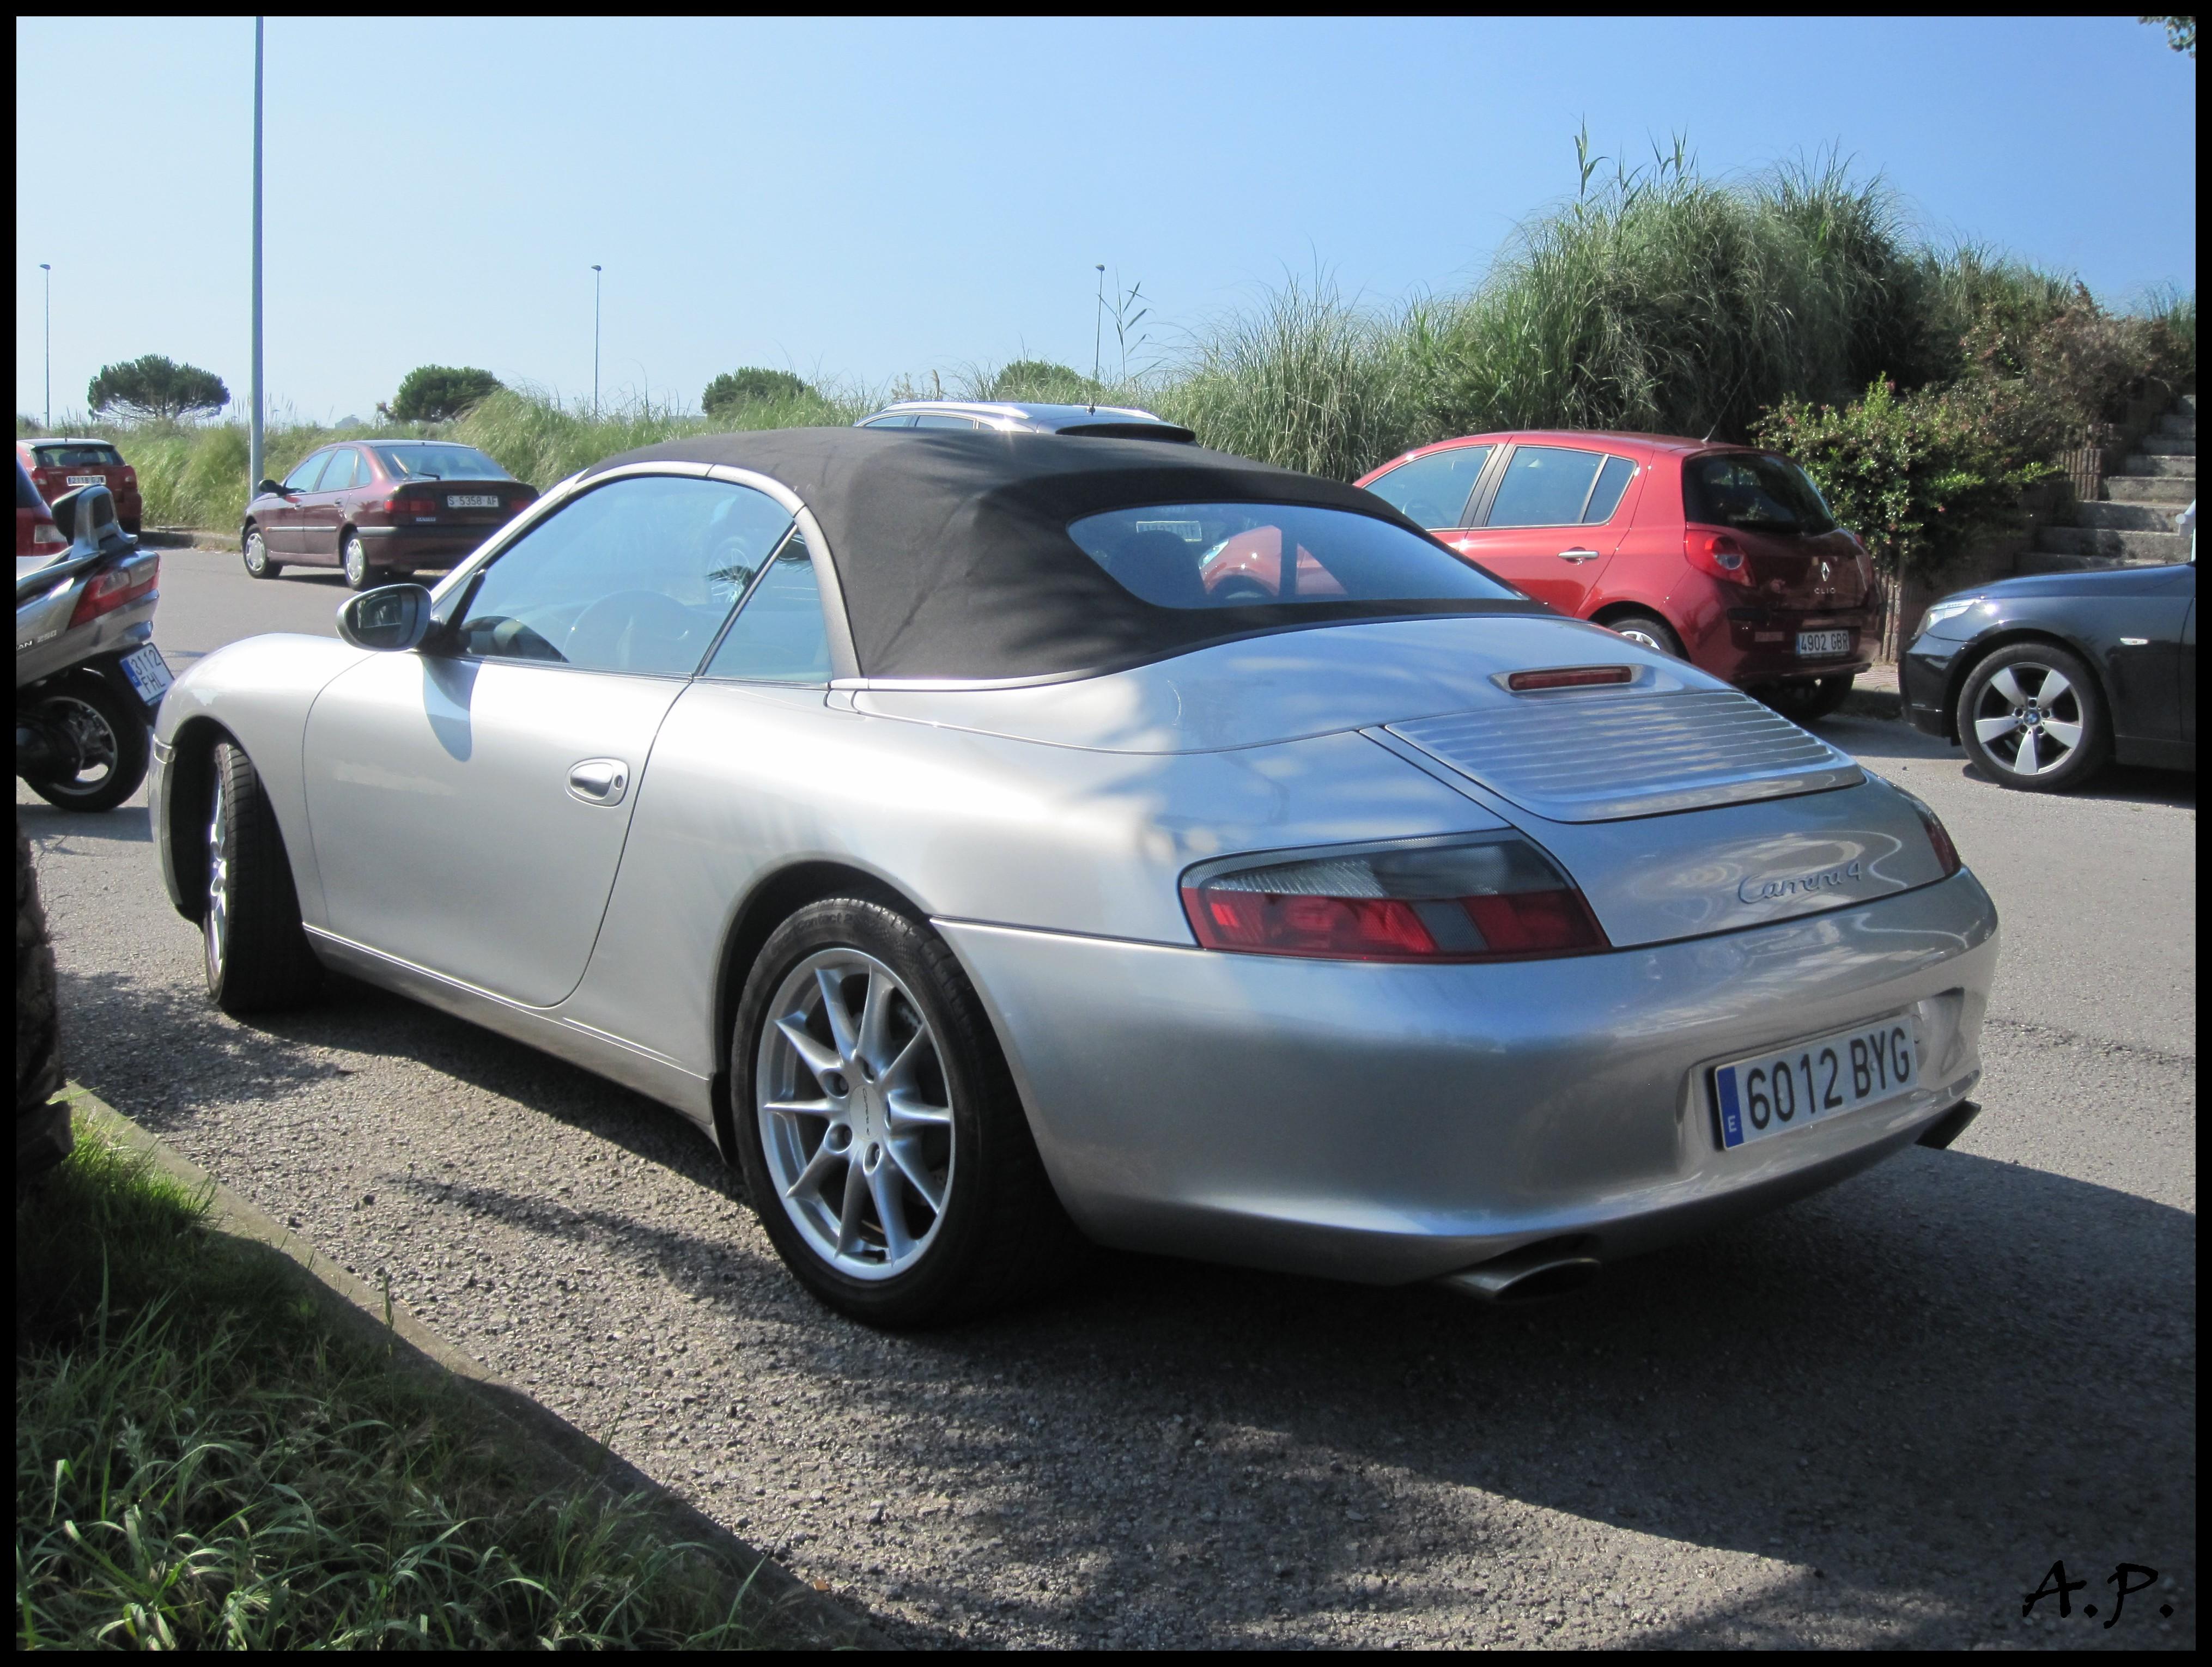 2002 Porsche 911 Carrera 4 Cabrio 996